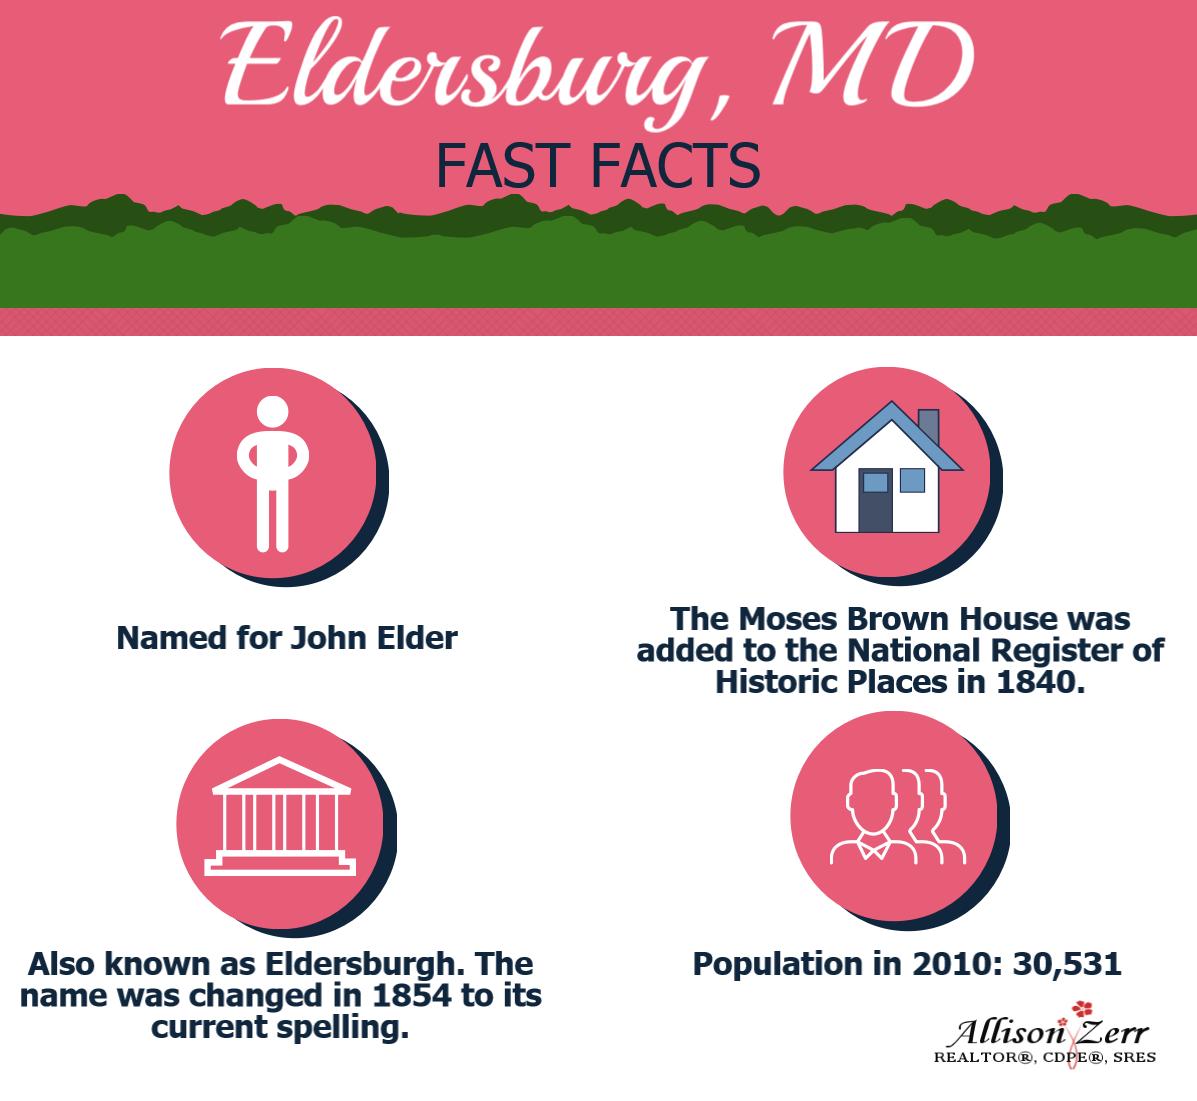 Eldersburg, MD Fast Facts